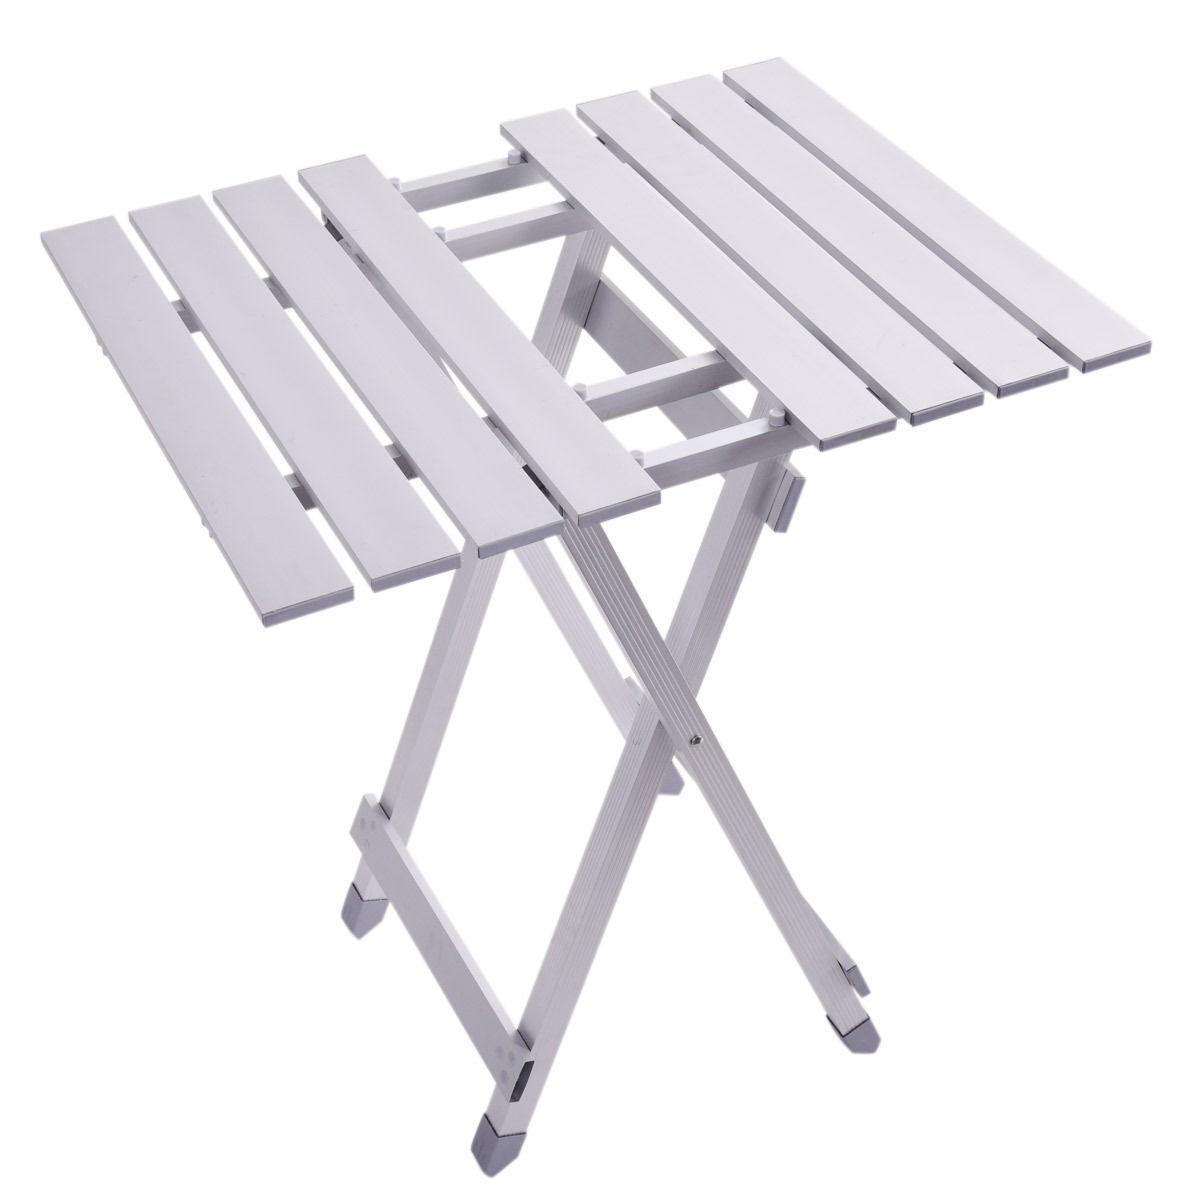 Portable Folding Table Roll Up Aluminum Alloy Picnic